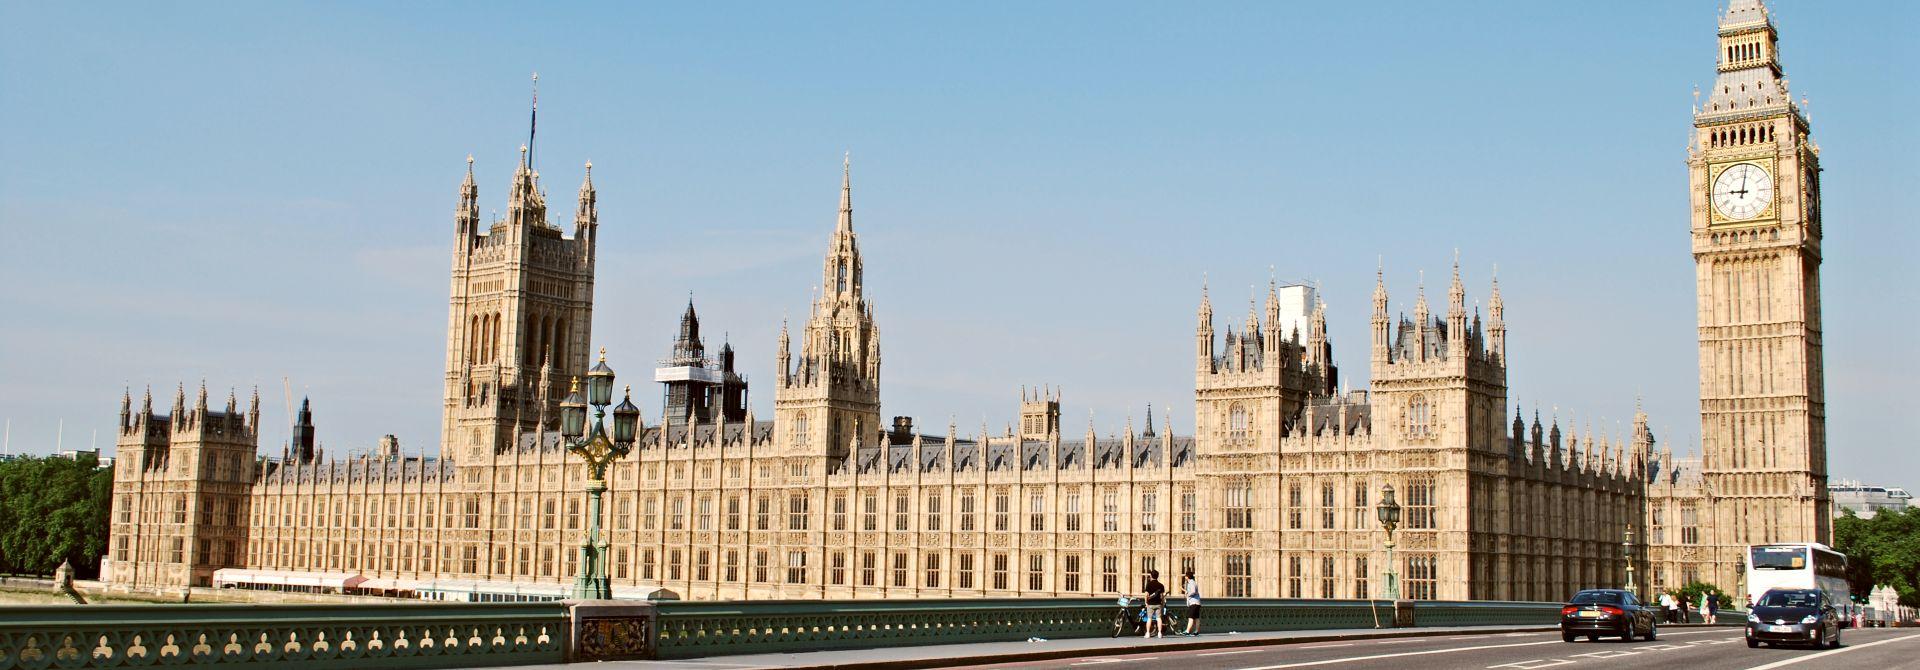 Houses of Parliament Hero